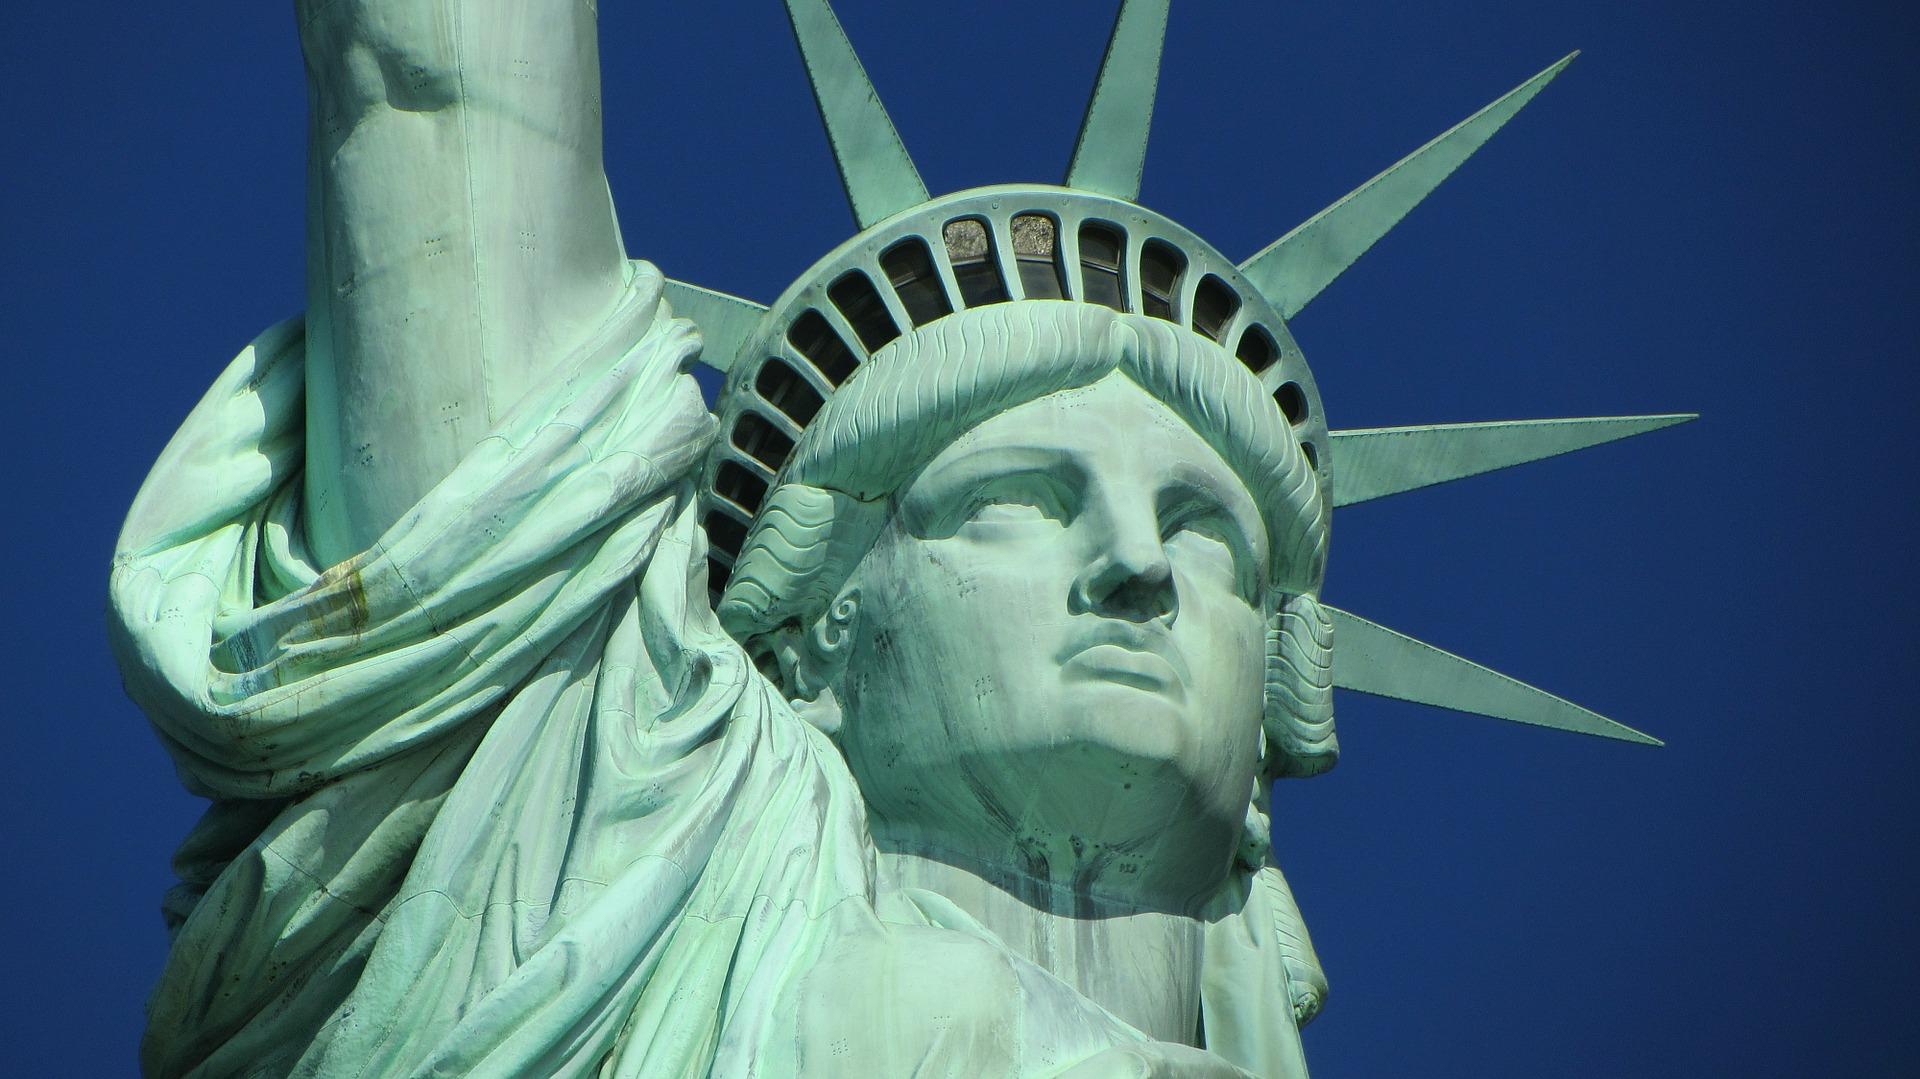 statue-of-liberty- America - US